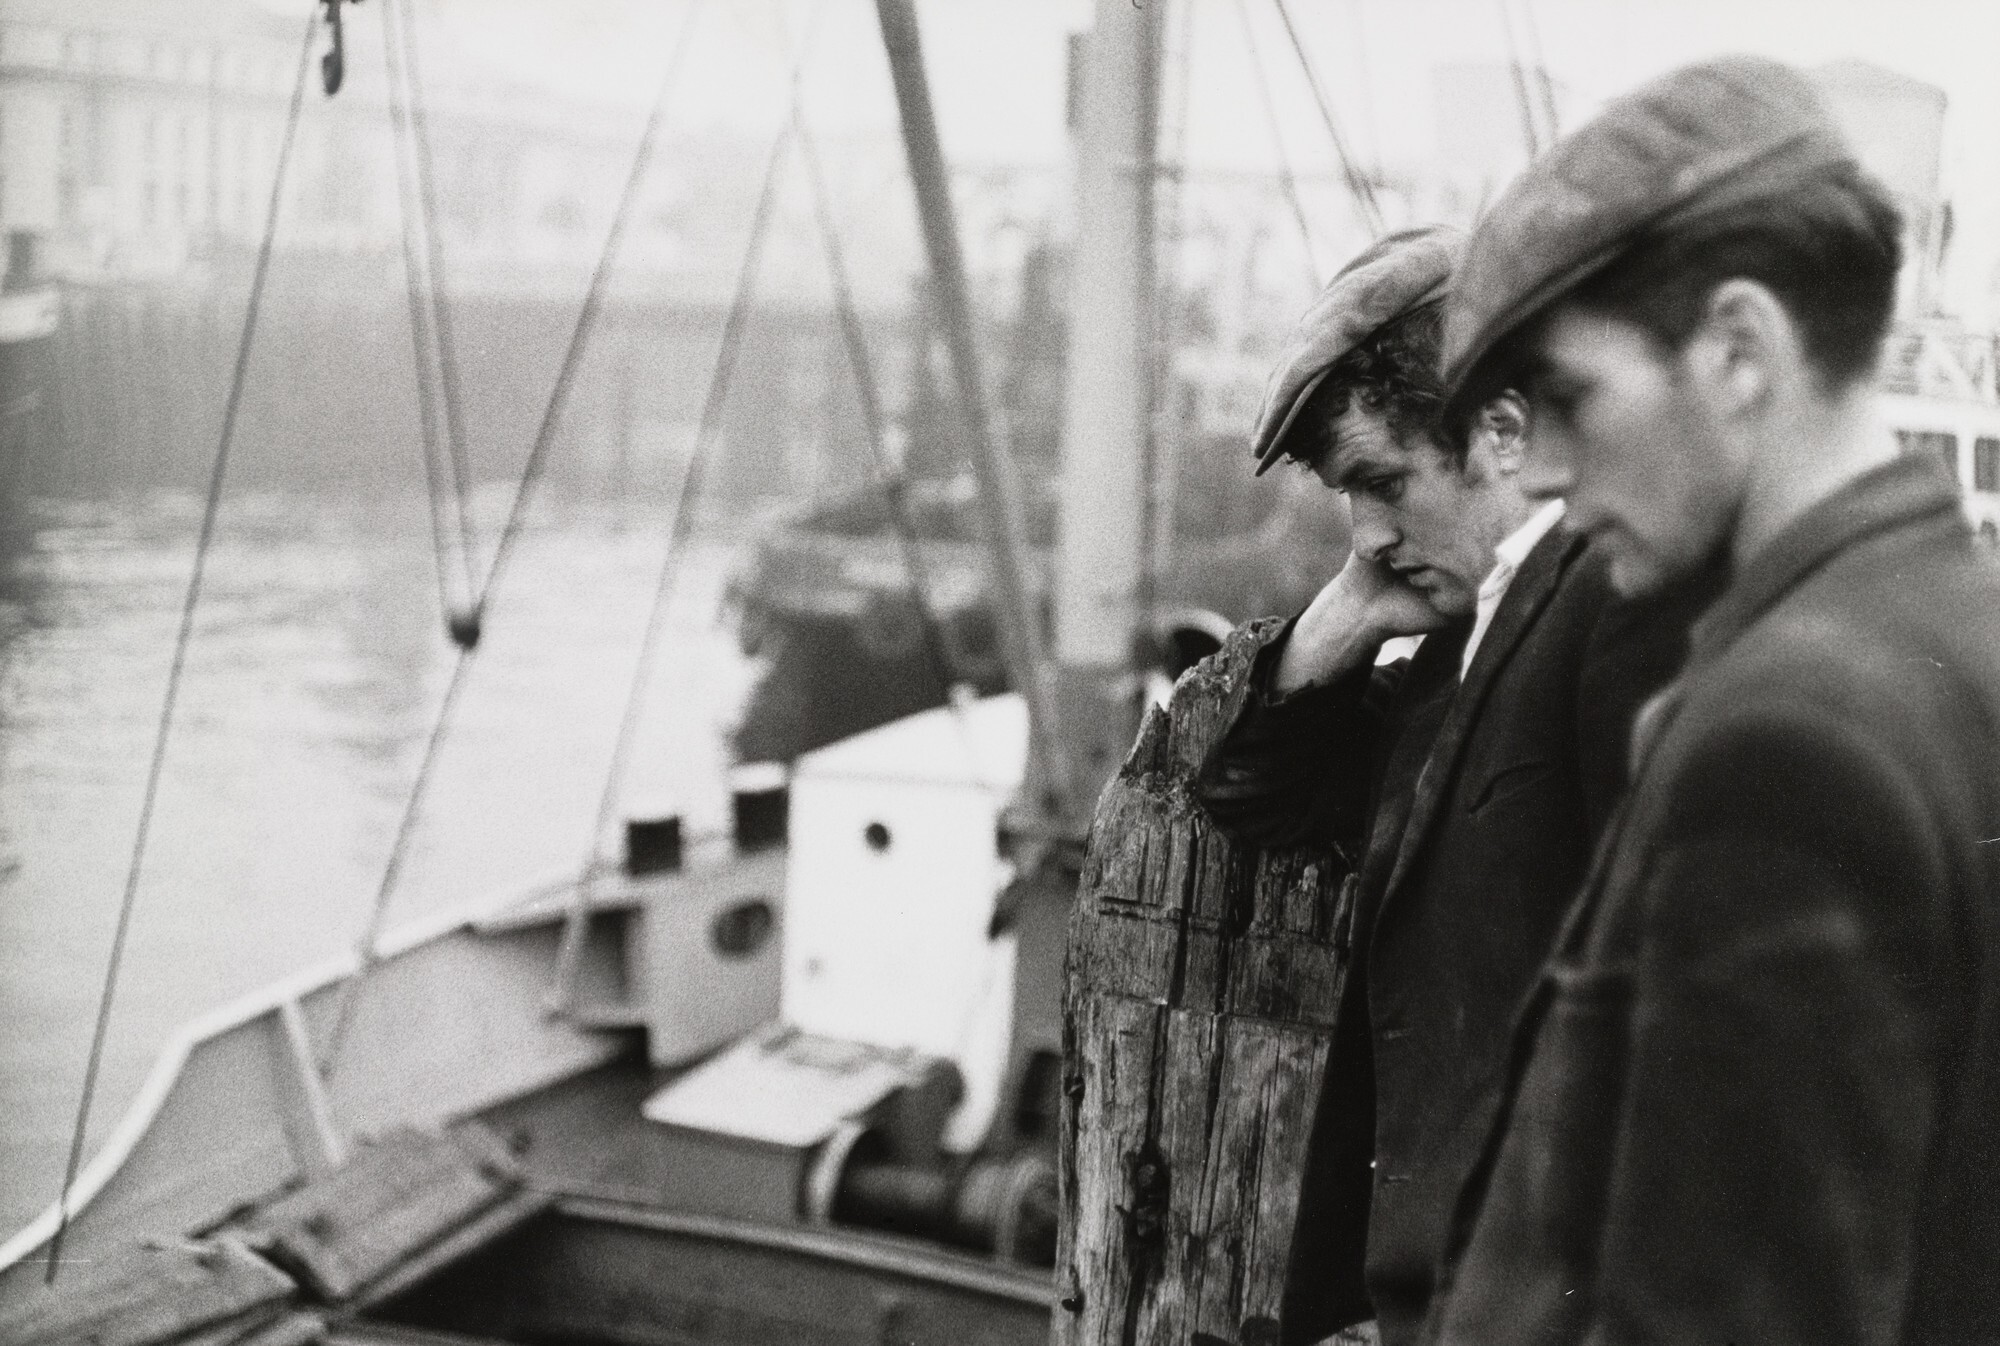 Ирландия, 1960. Фотограф Анри Картье-Брессон